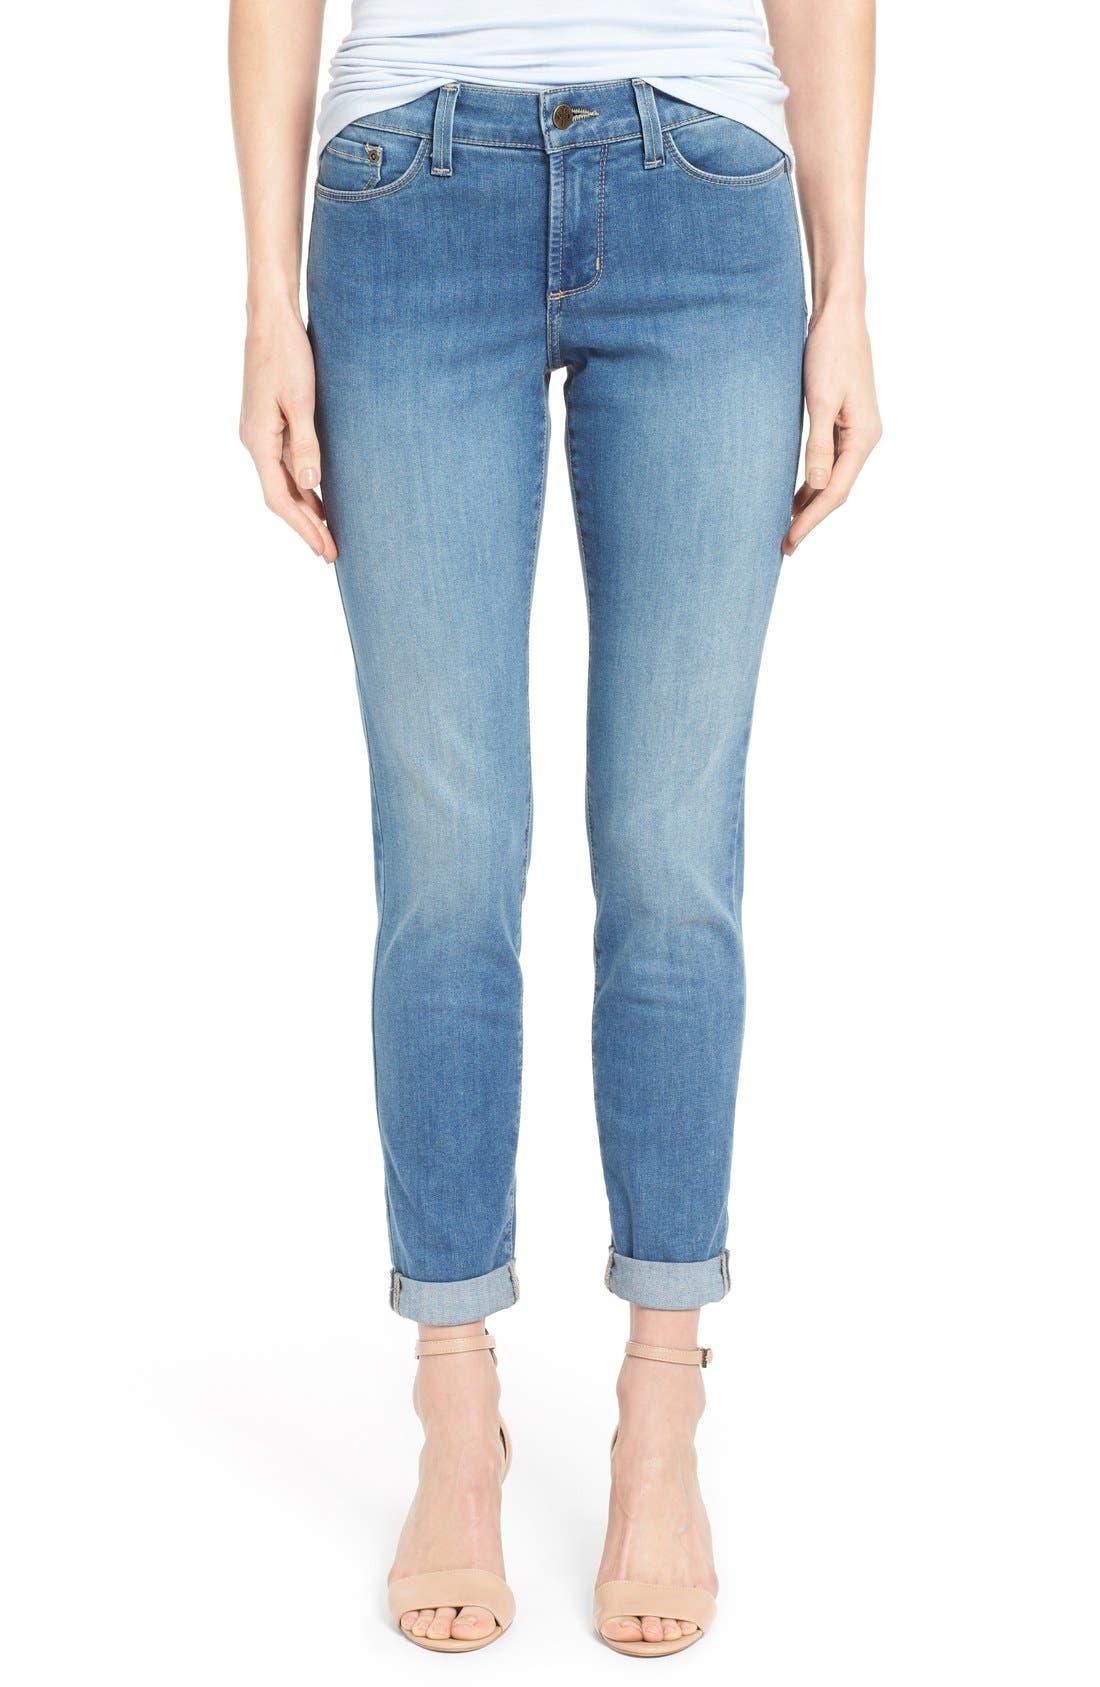 Main Image - NYDJ 'Anabelle' Stretch Skinny Boyfriend Jeans (Upper Falls) (Regular & Petite)